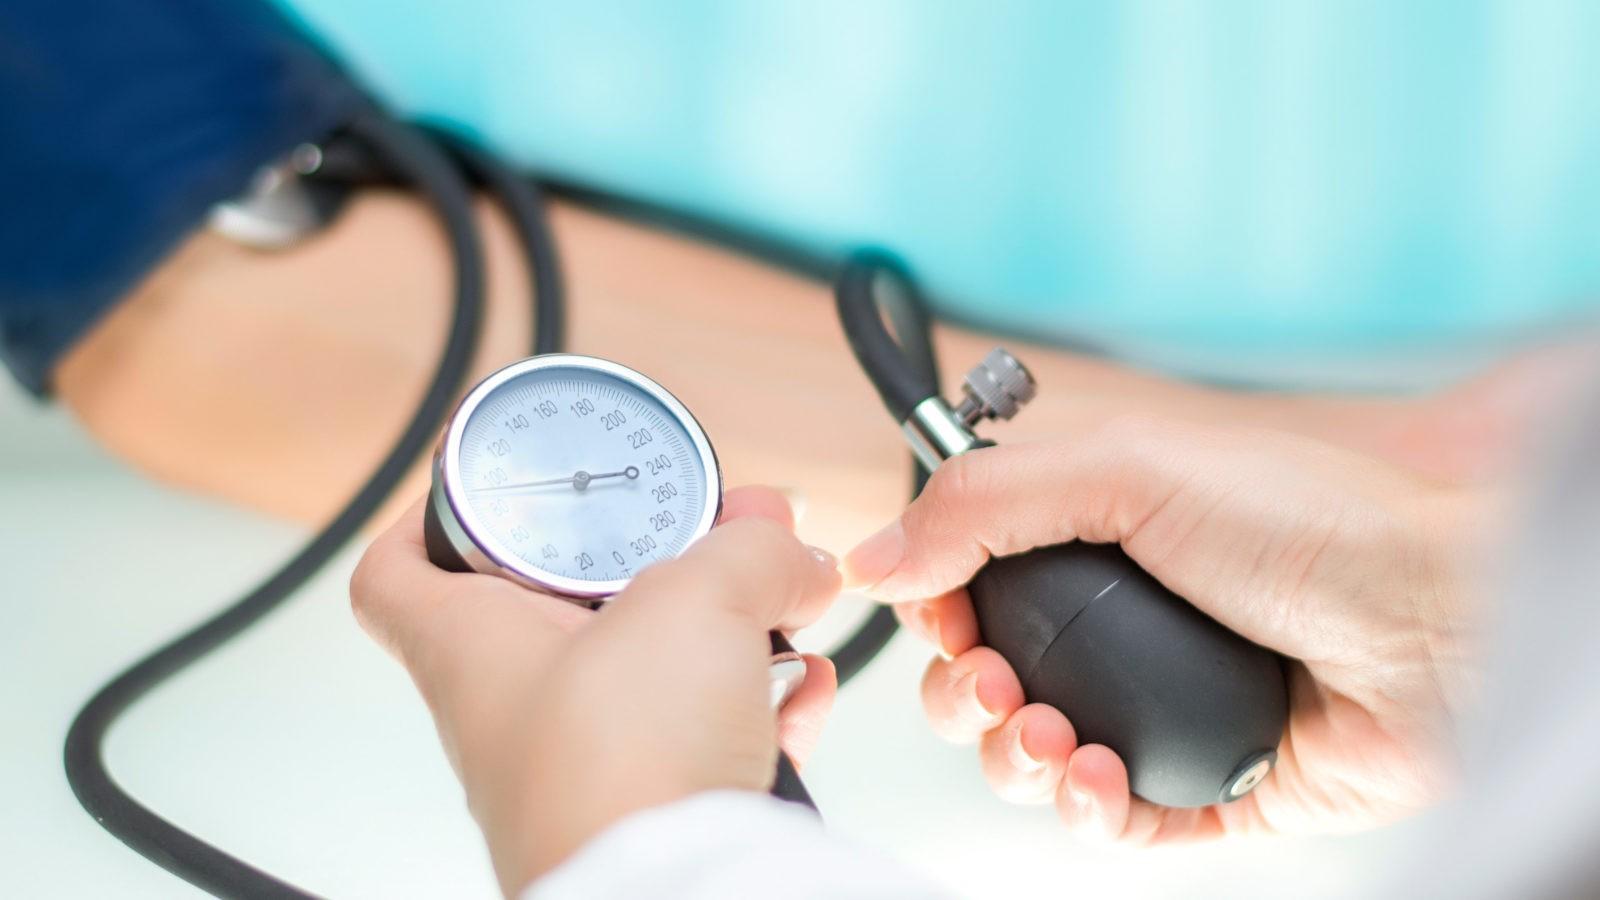 ipertensione arteriosa dieta consigliata